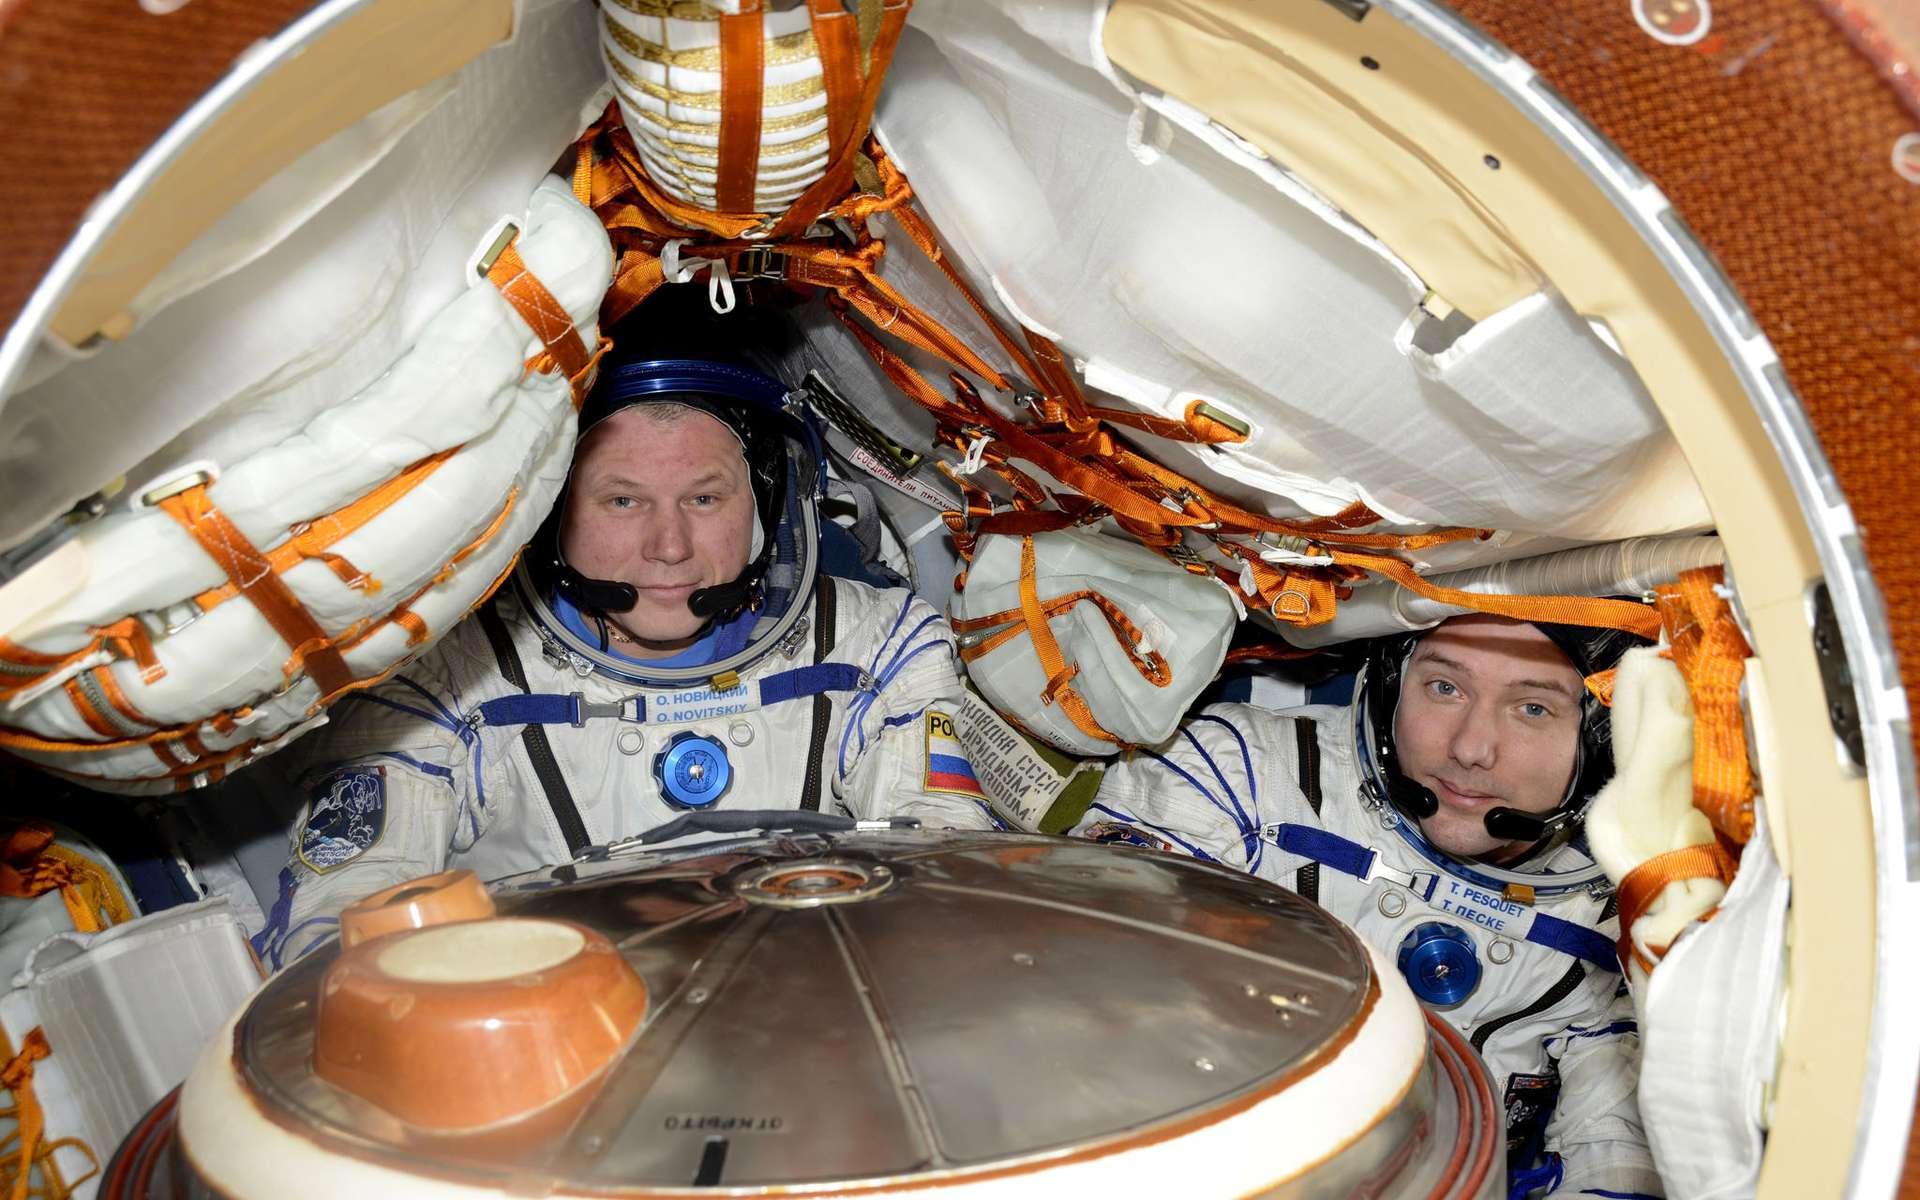 Oleg Novitskiy et Thomas Pesquet à bord de la capsule Soyouz qui les redescendra sur Terre. © ESA, Nasa